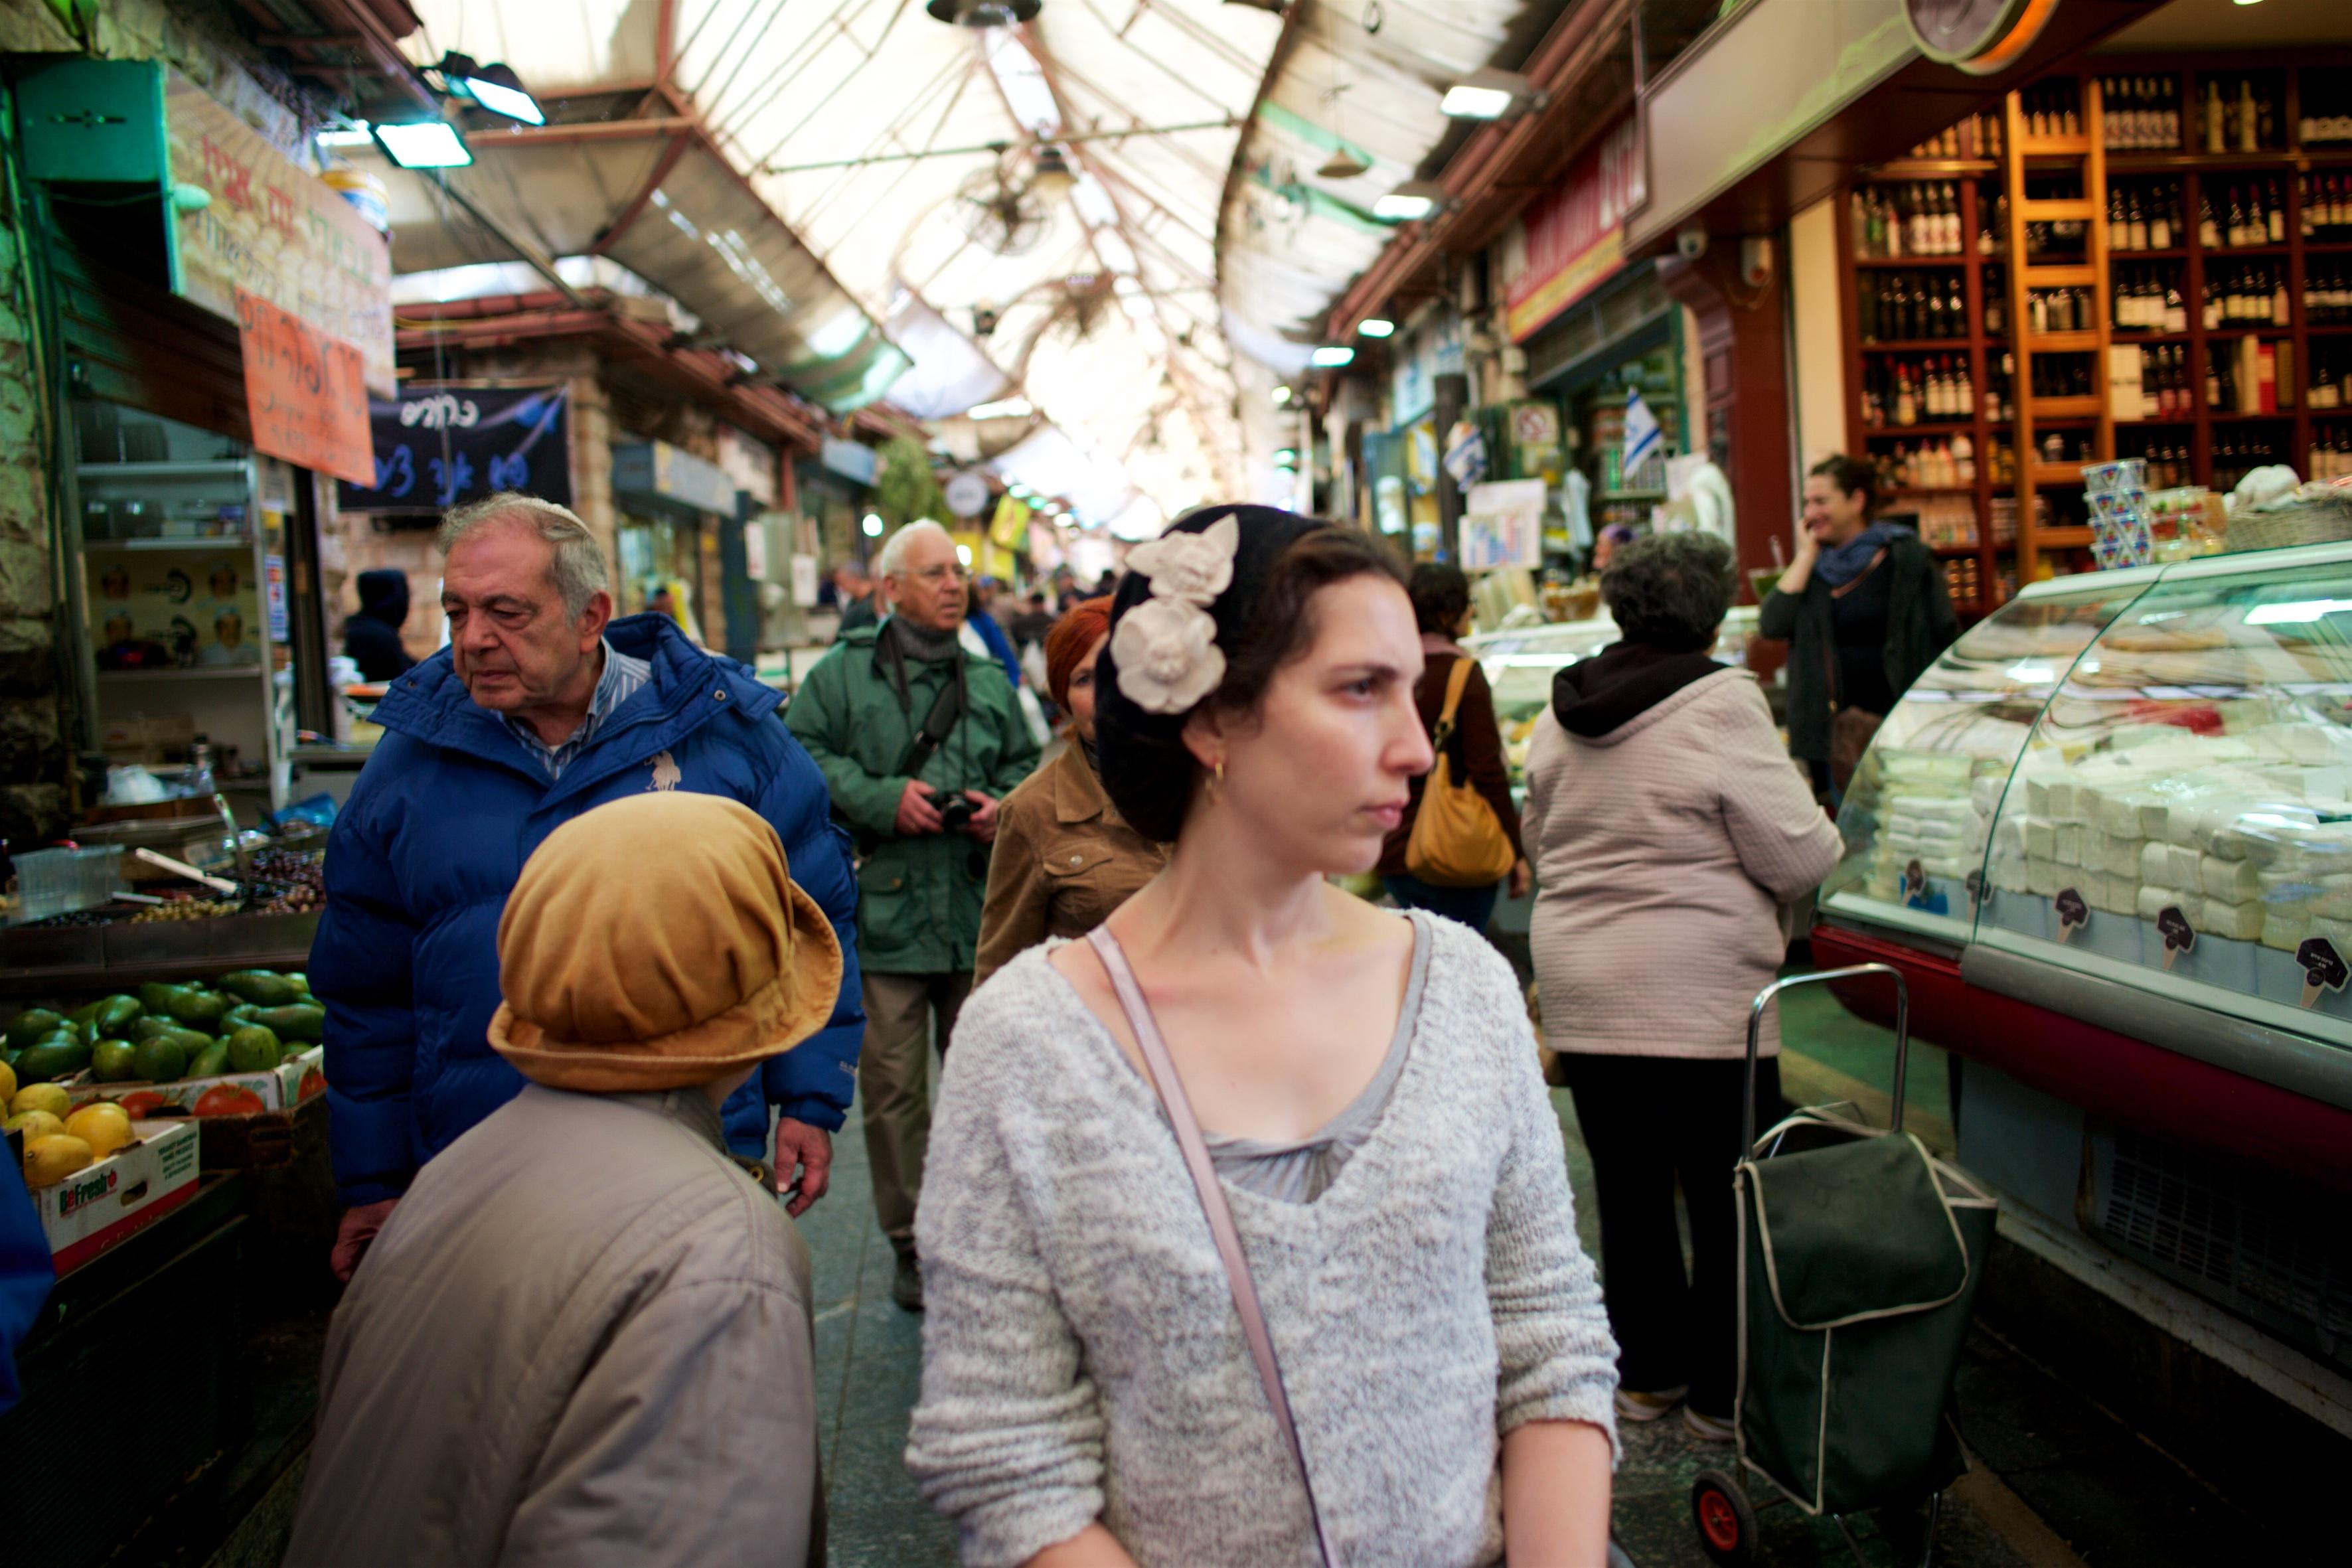 At the market, Jerusalem